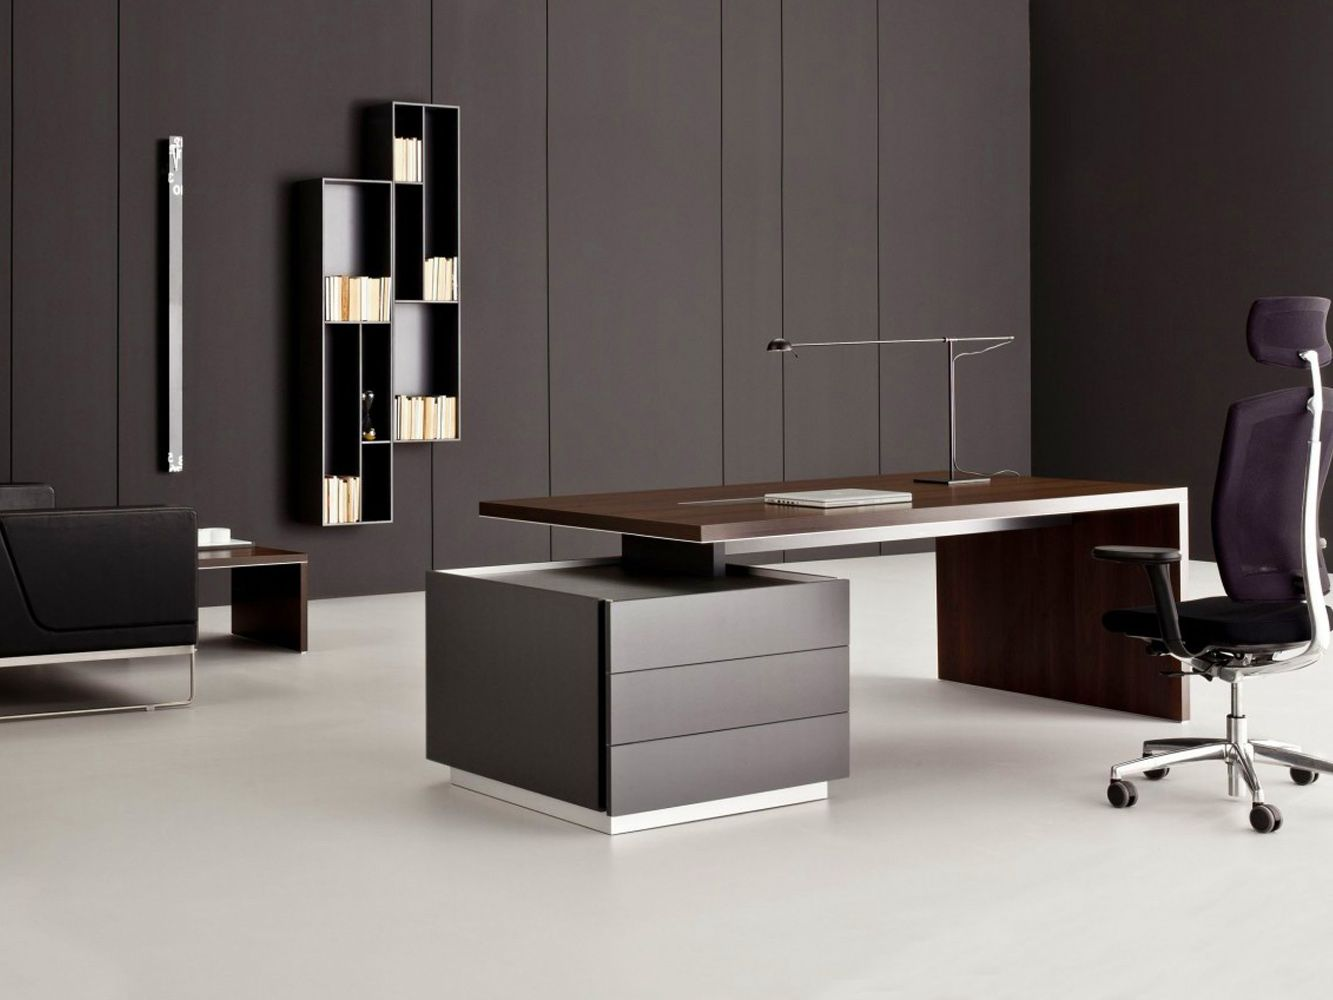 Modern Executive High End Office Furniture ideas wallpaper ...